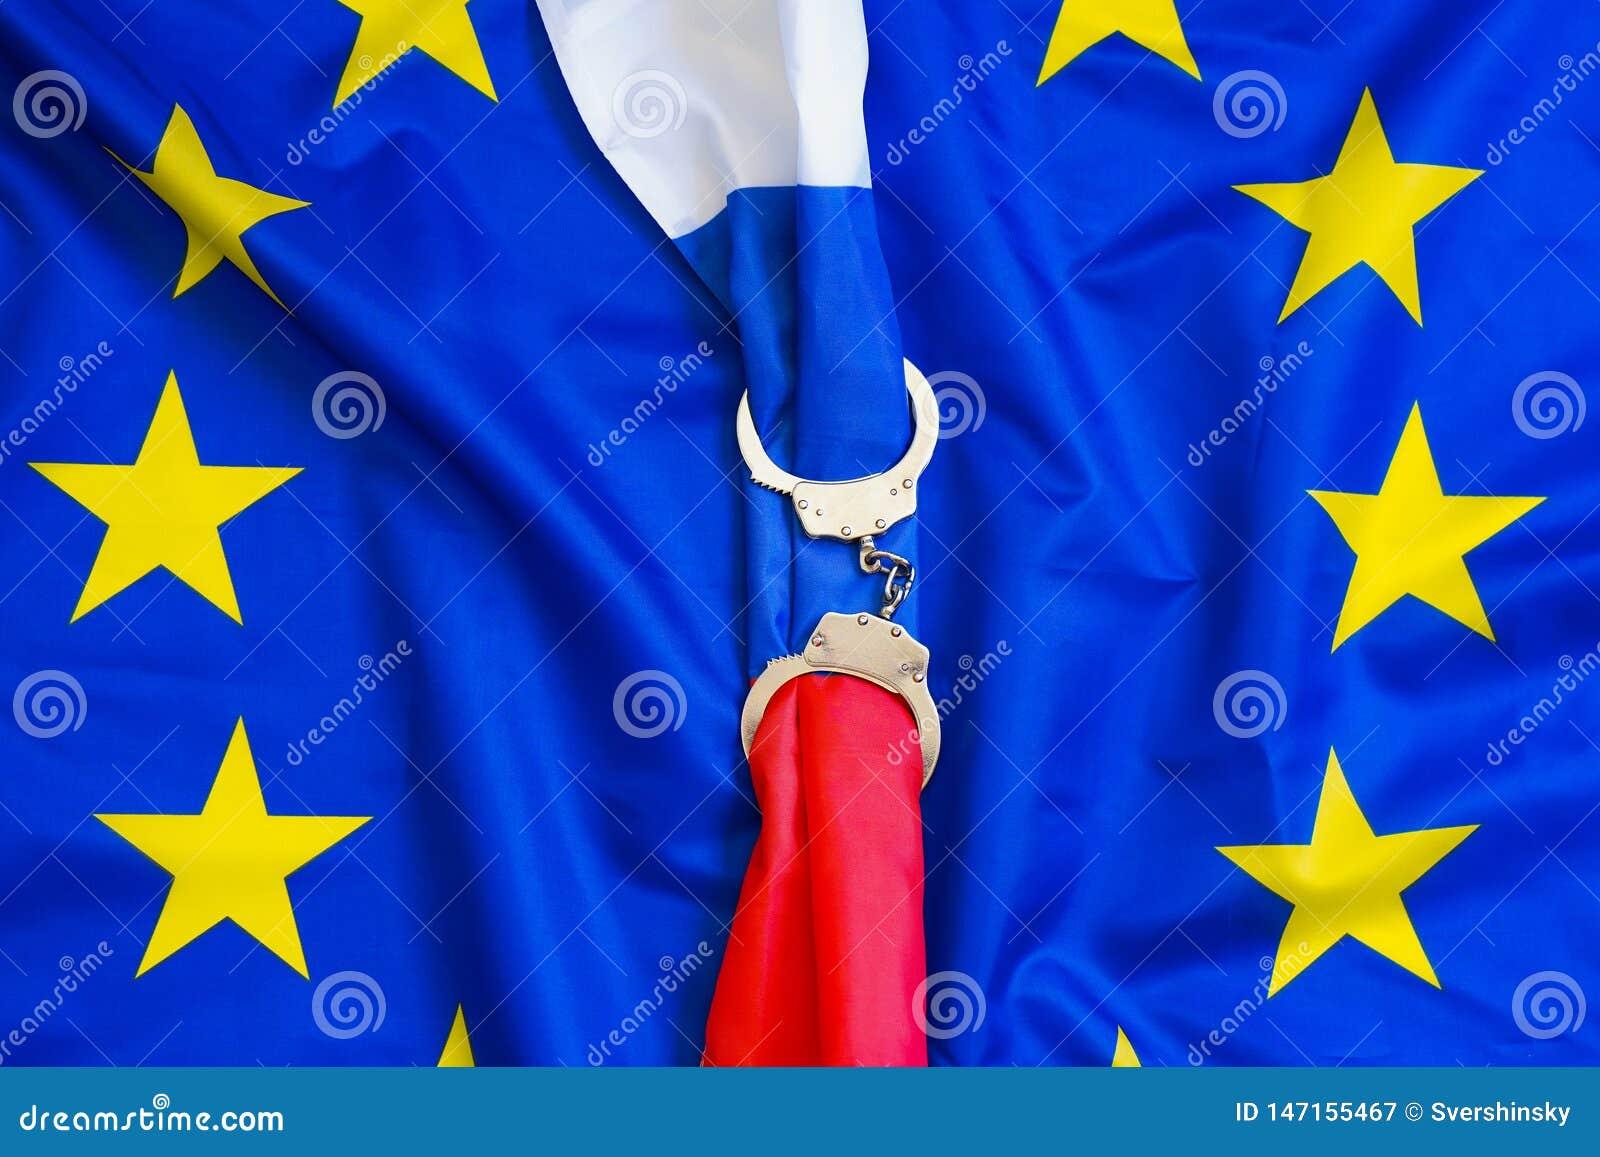 Unione Europea E